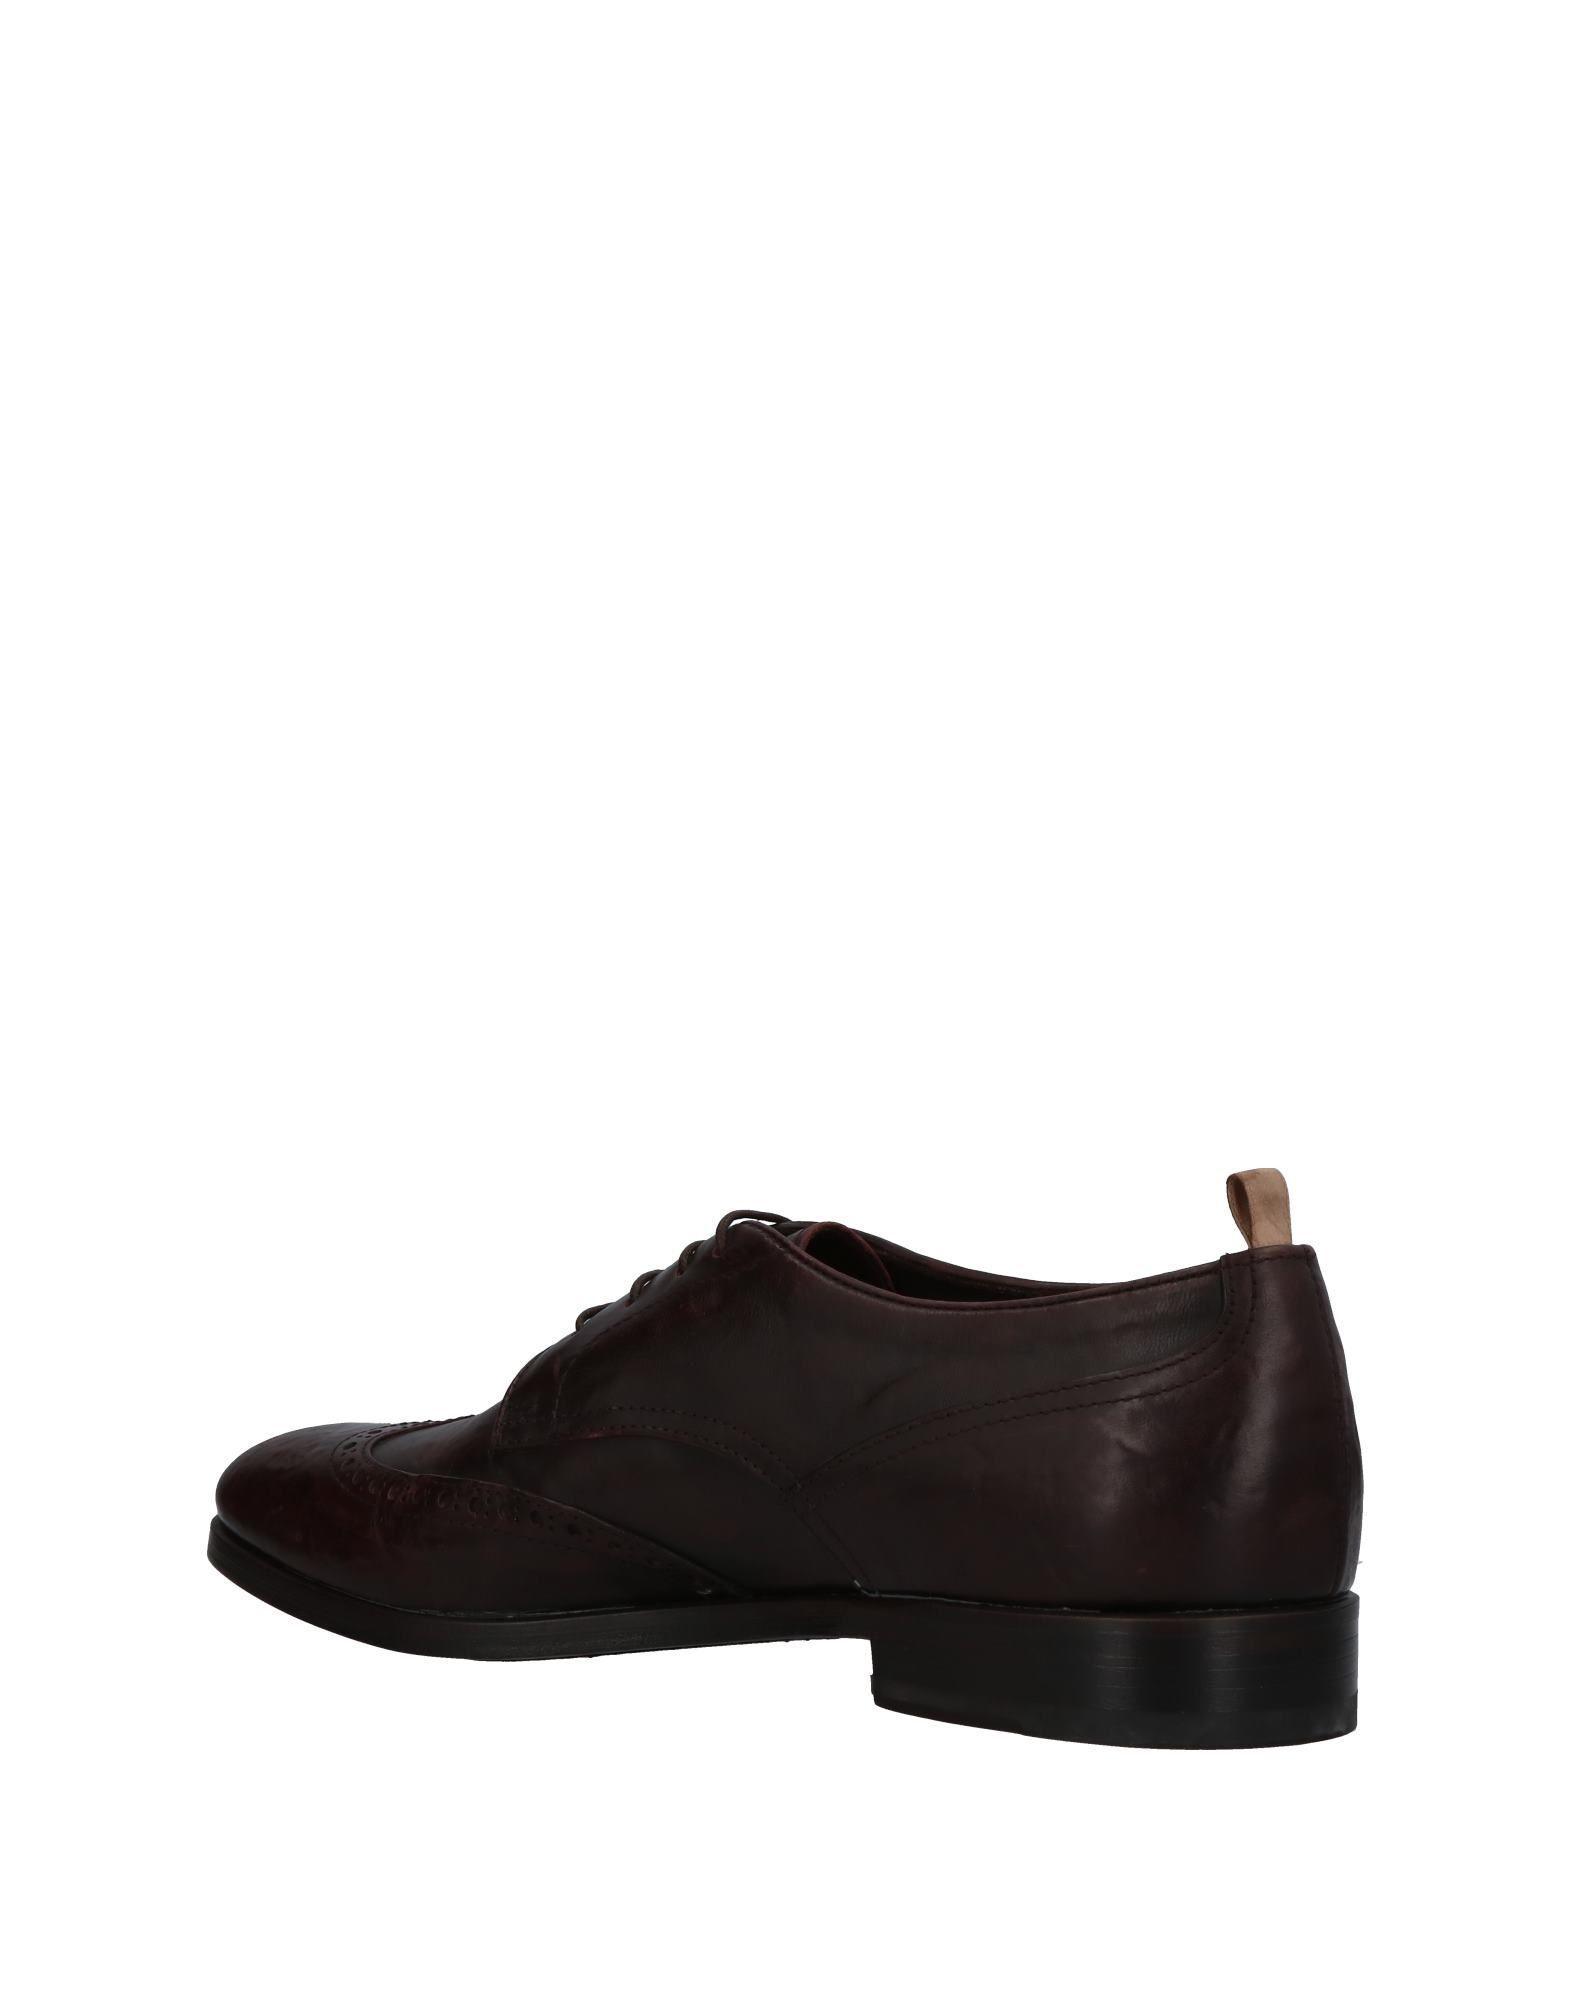 FOOTWEAR - Lace-up shoes Mauron Obmx2Ig